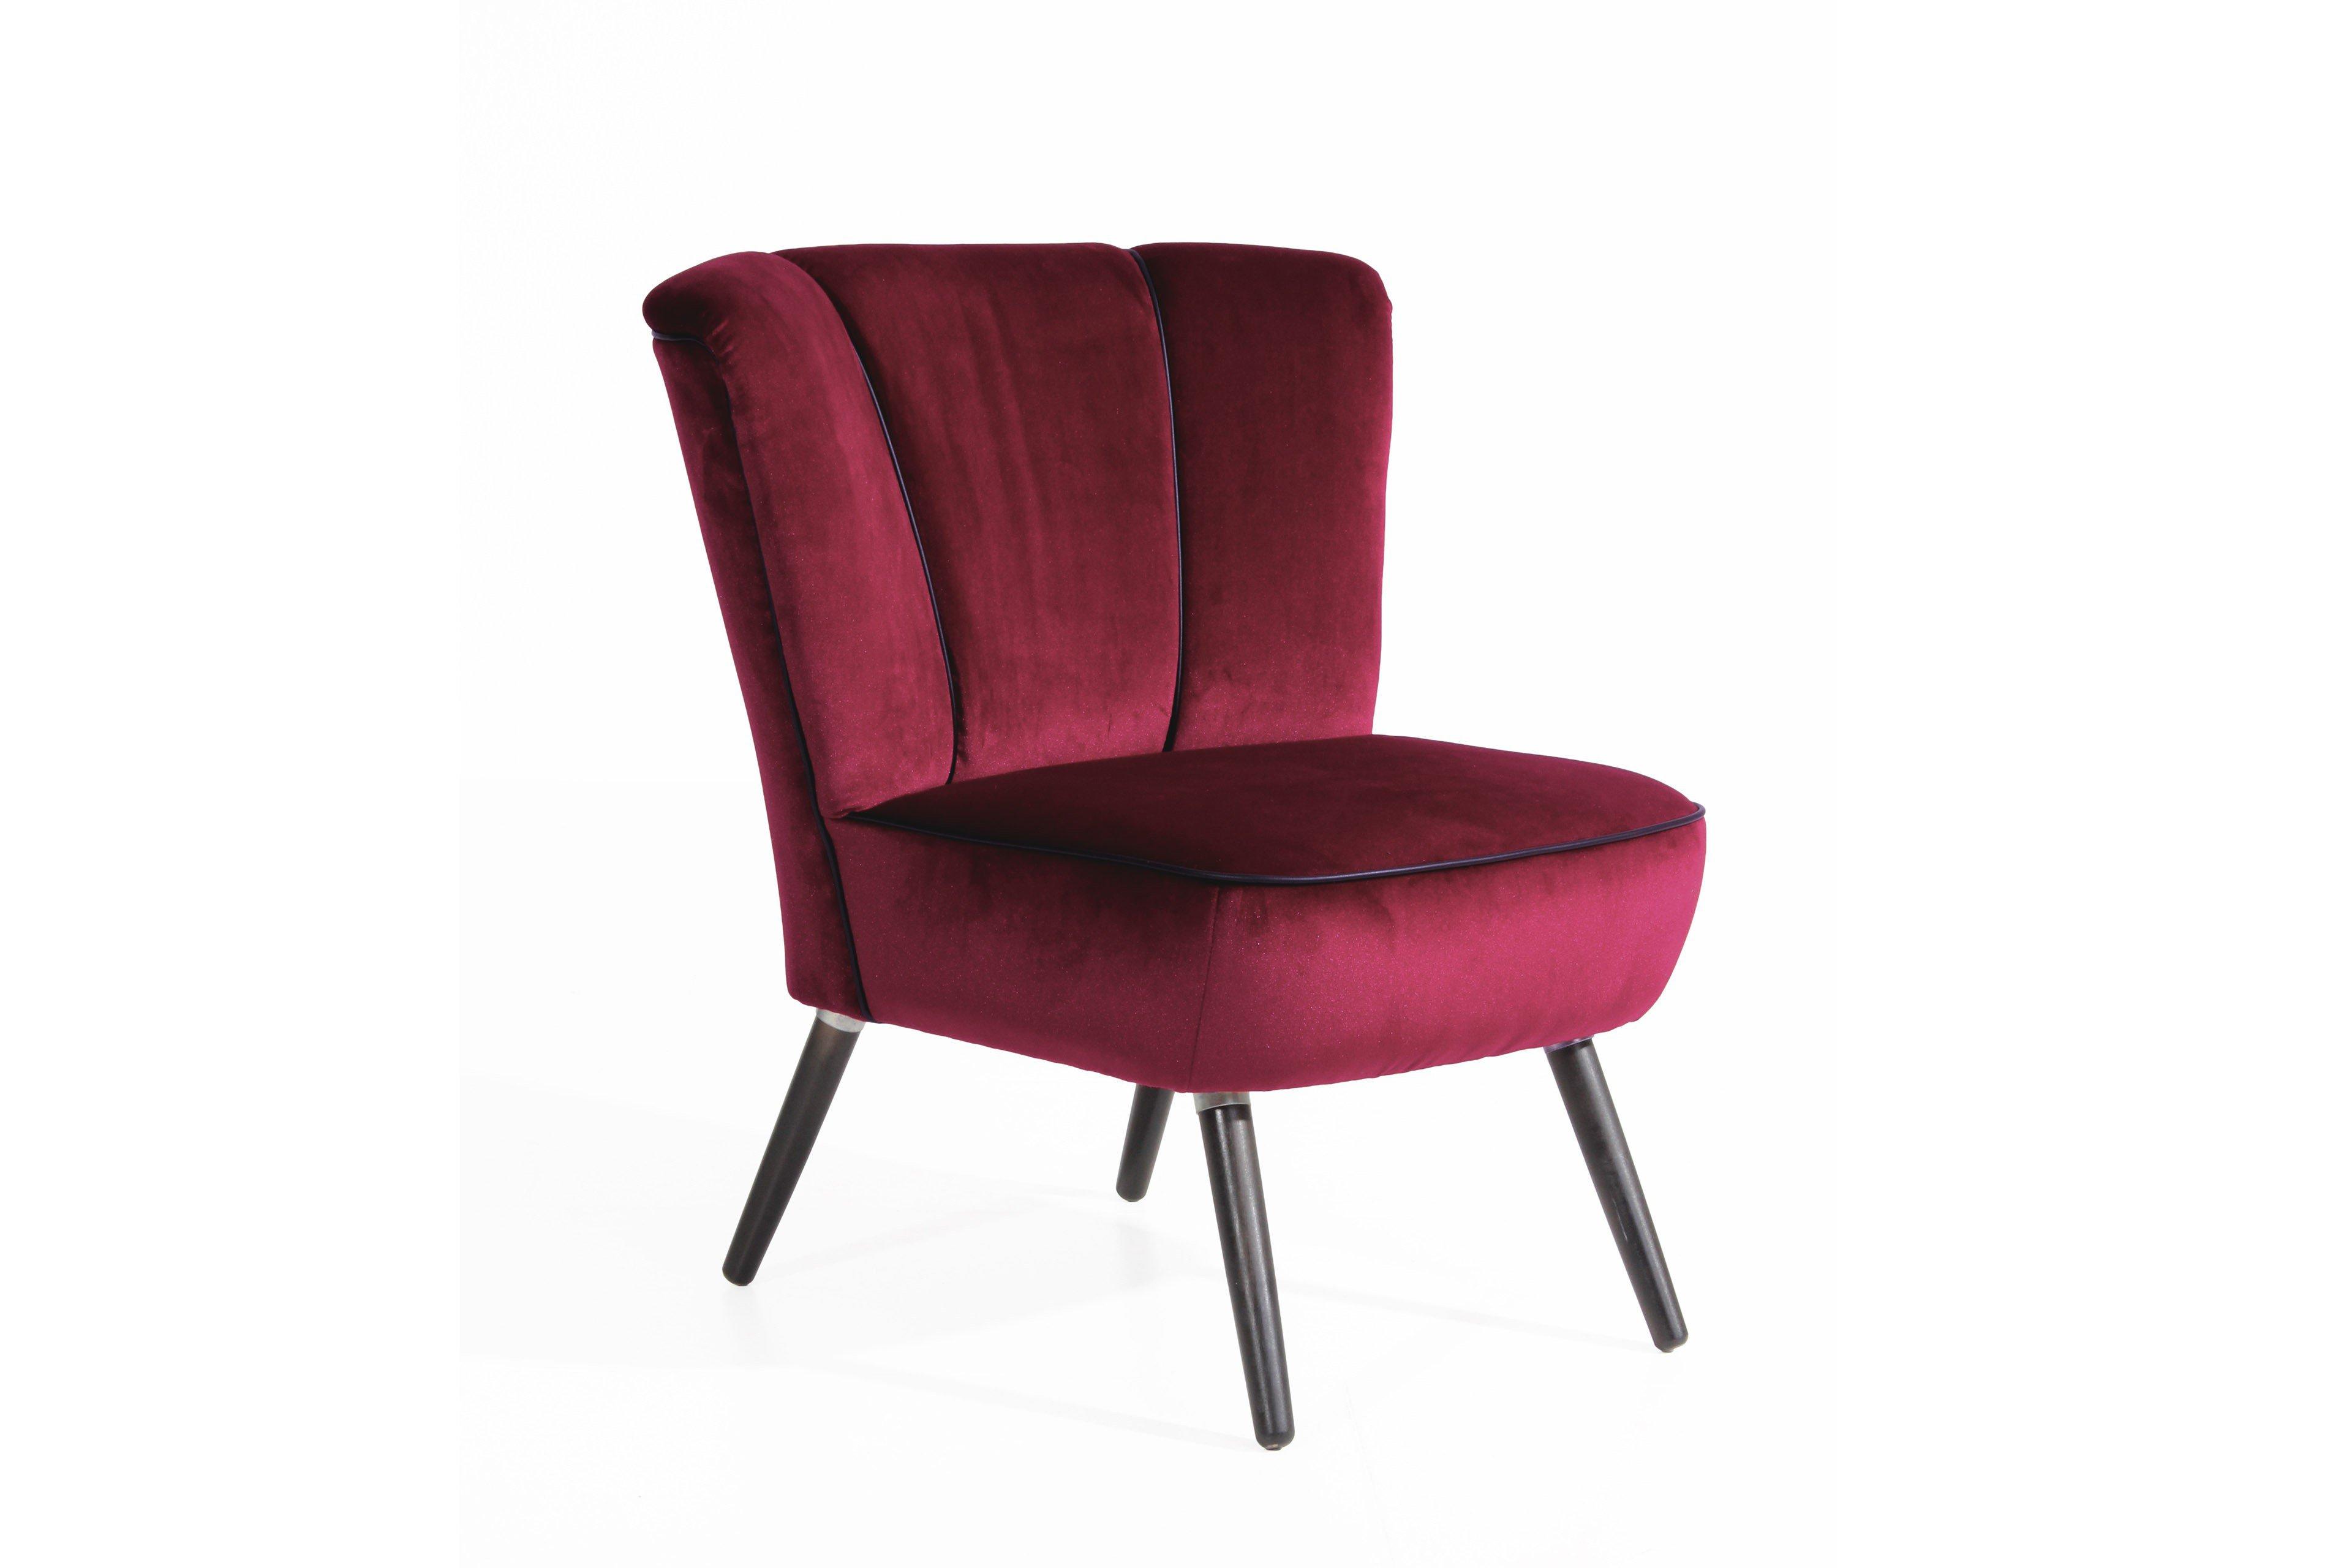 max winzer elias sessel in dunkelrot m bel letz ihr online shop. Black Bedroom Furniture Sets. Home Design Ideas